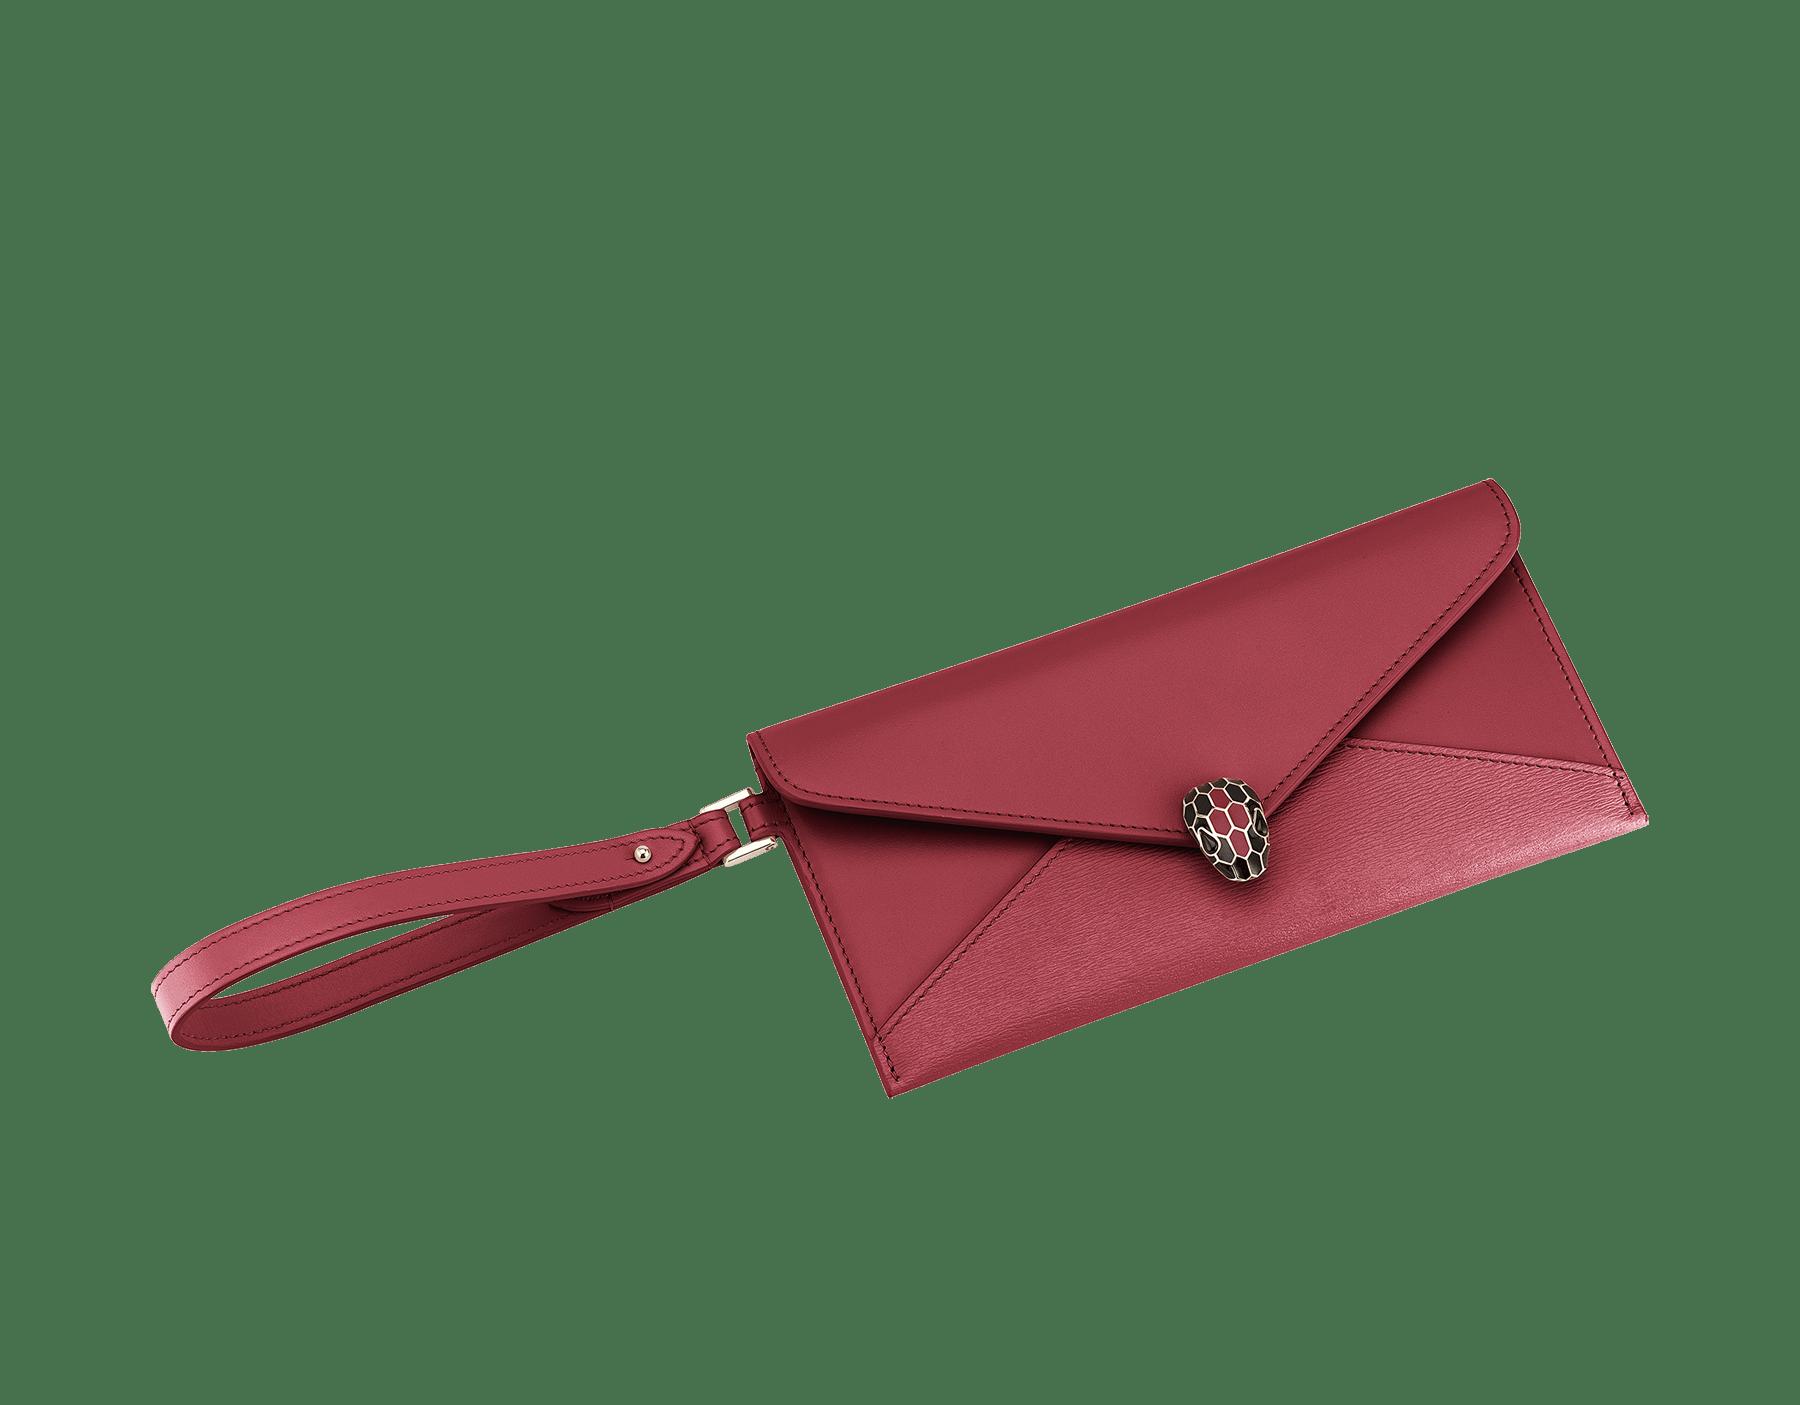 Serpenti Forever envelope case in Roman garnet calf leather and Roman garnet goatskin. Iconic snakehead charm in black and Roman garnet enamel, with black onyx eyes. 289089 image 1